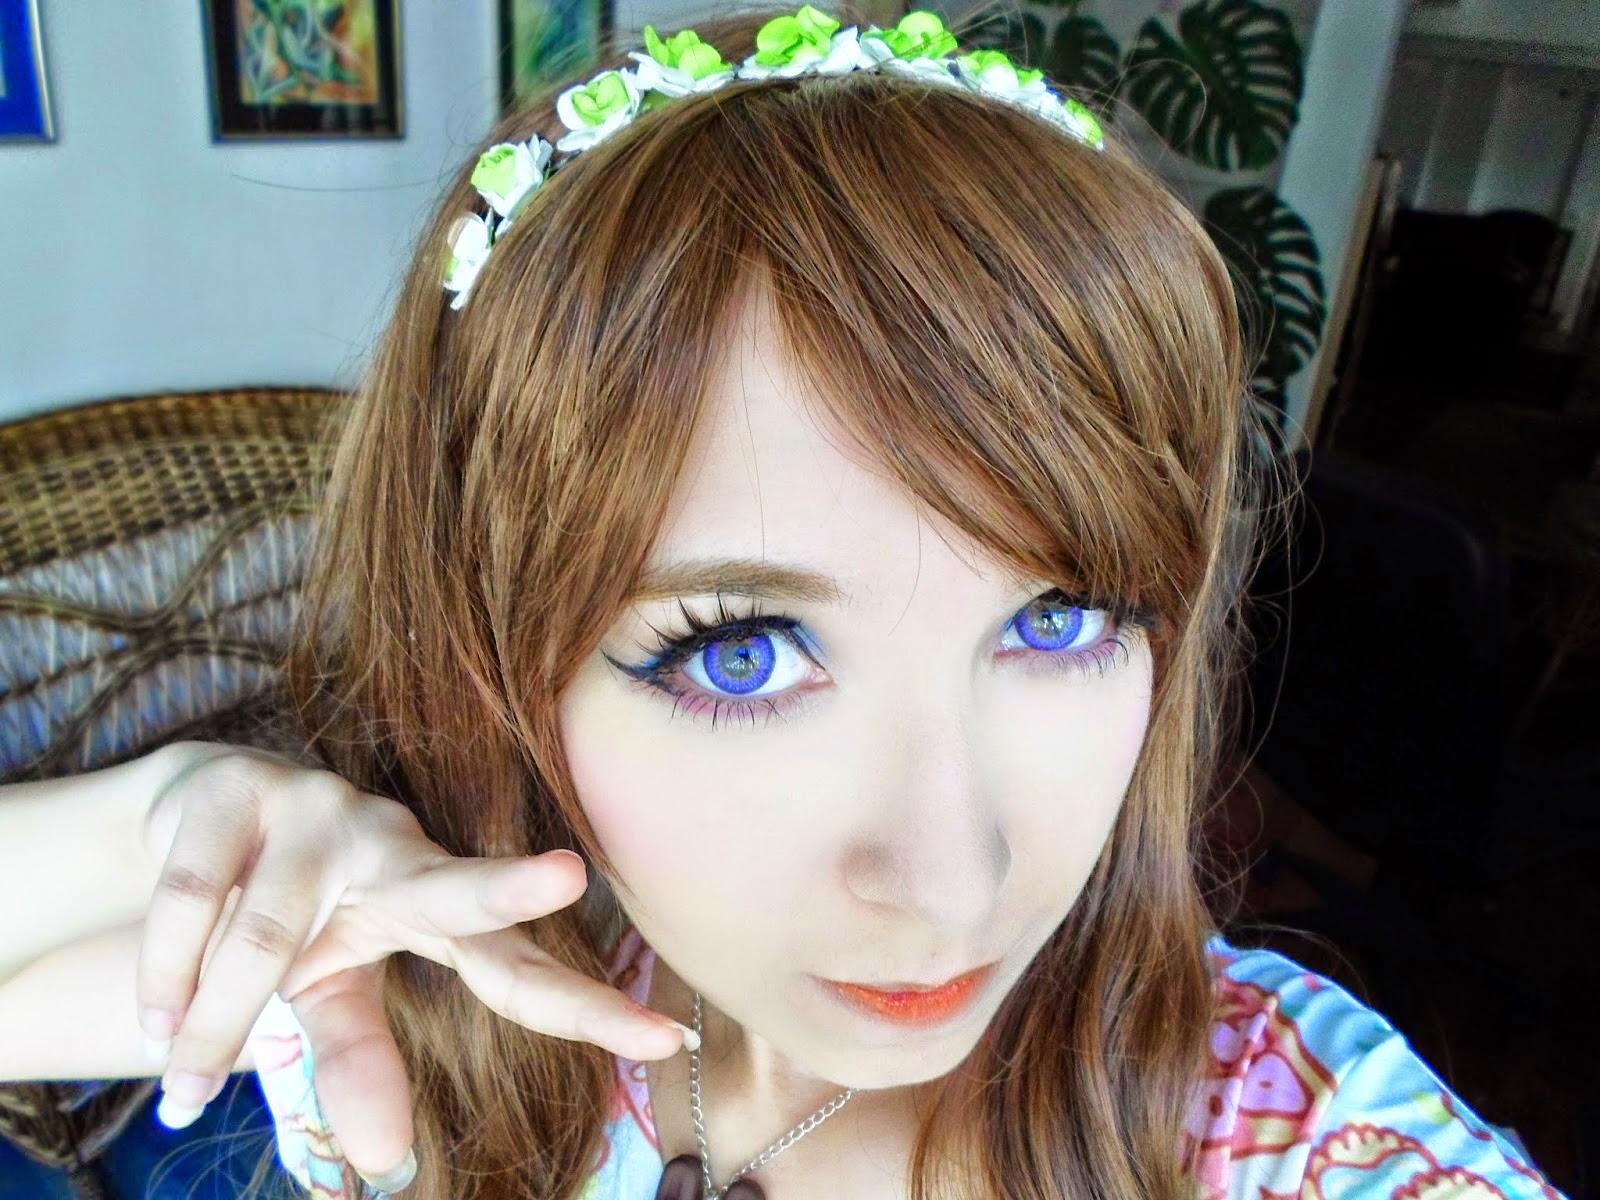 Violet Circle Lenses for Light Eyes: Dolly Eye Puffy 3 tones